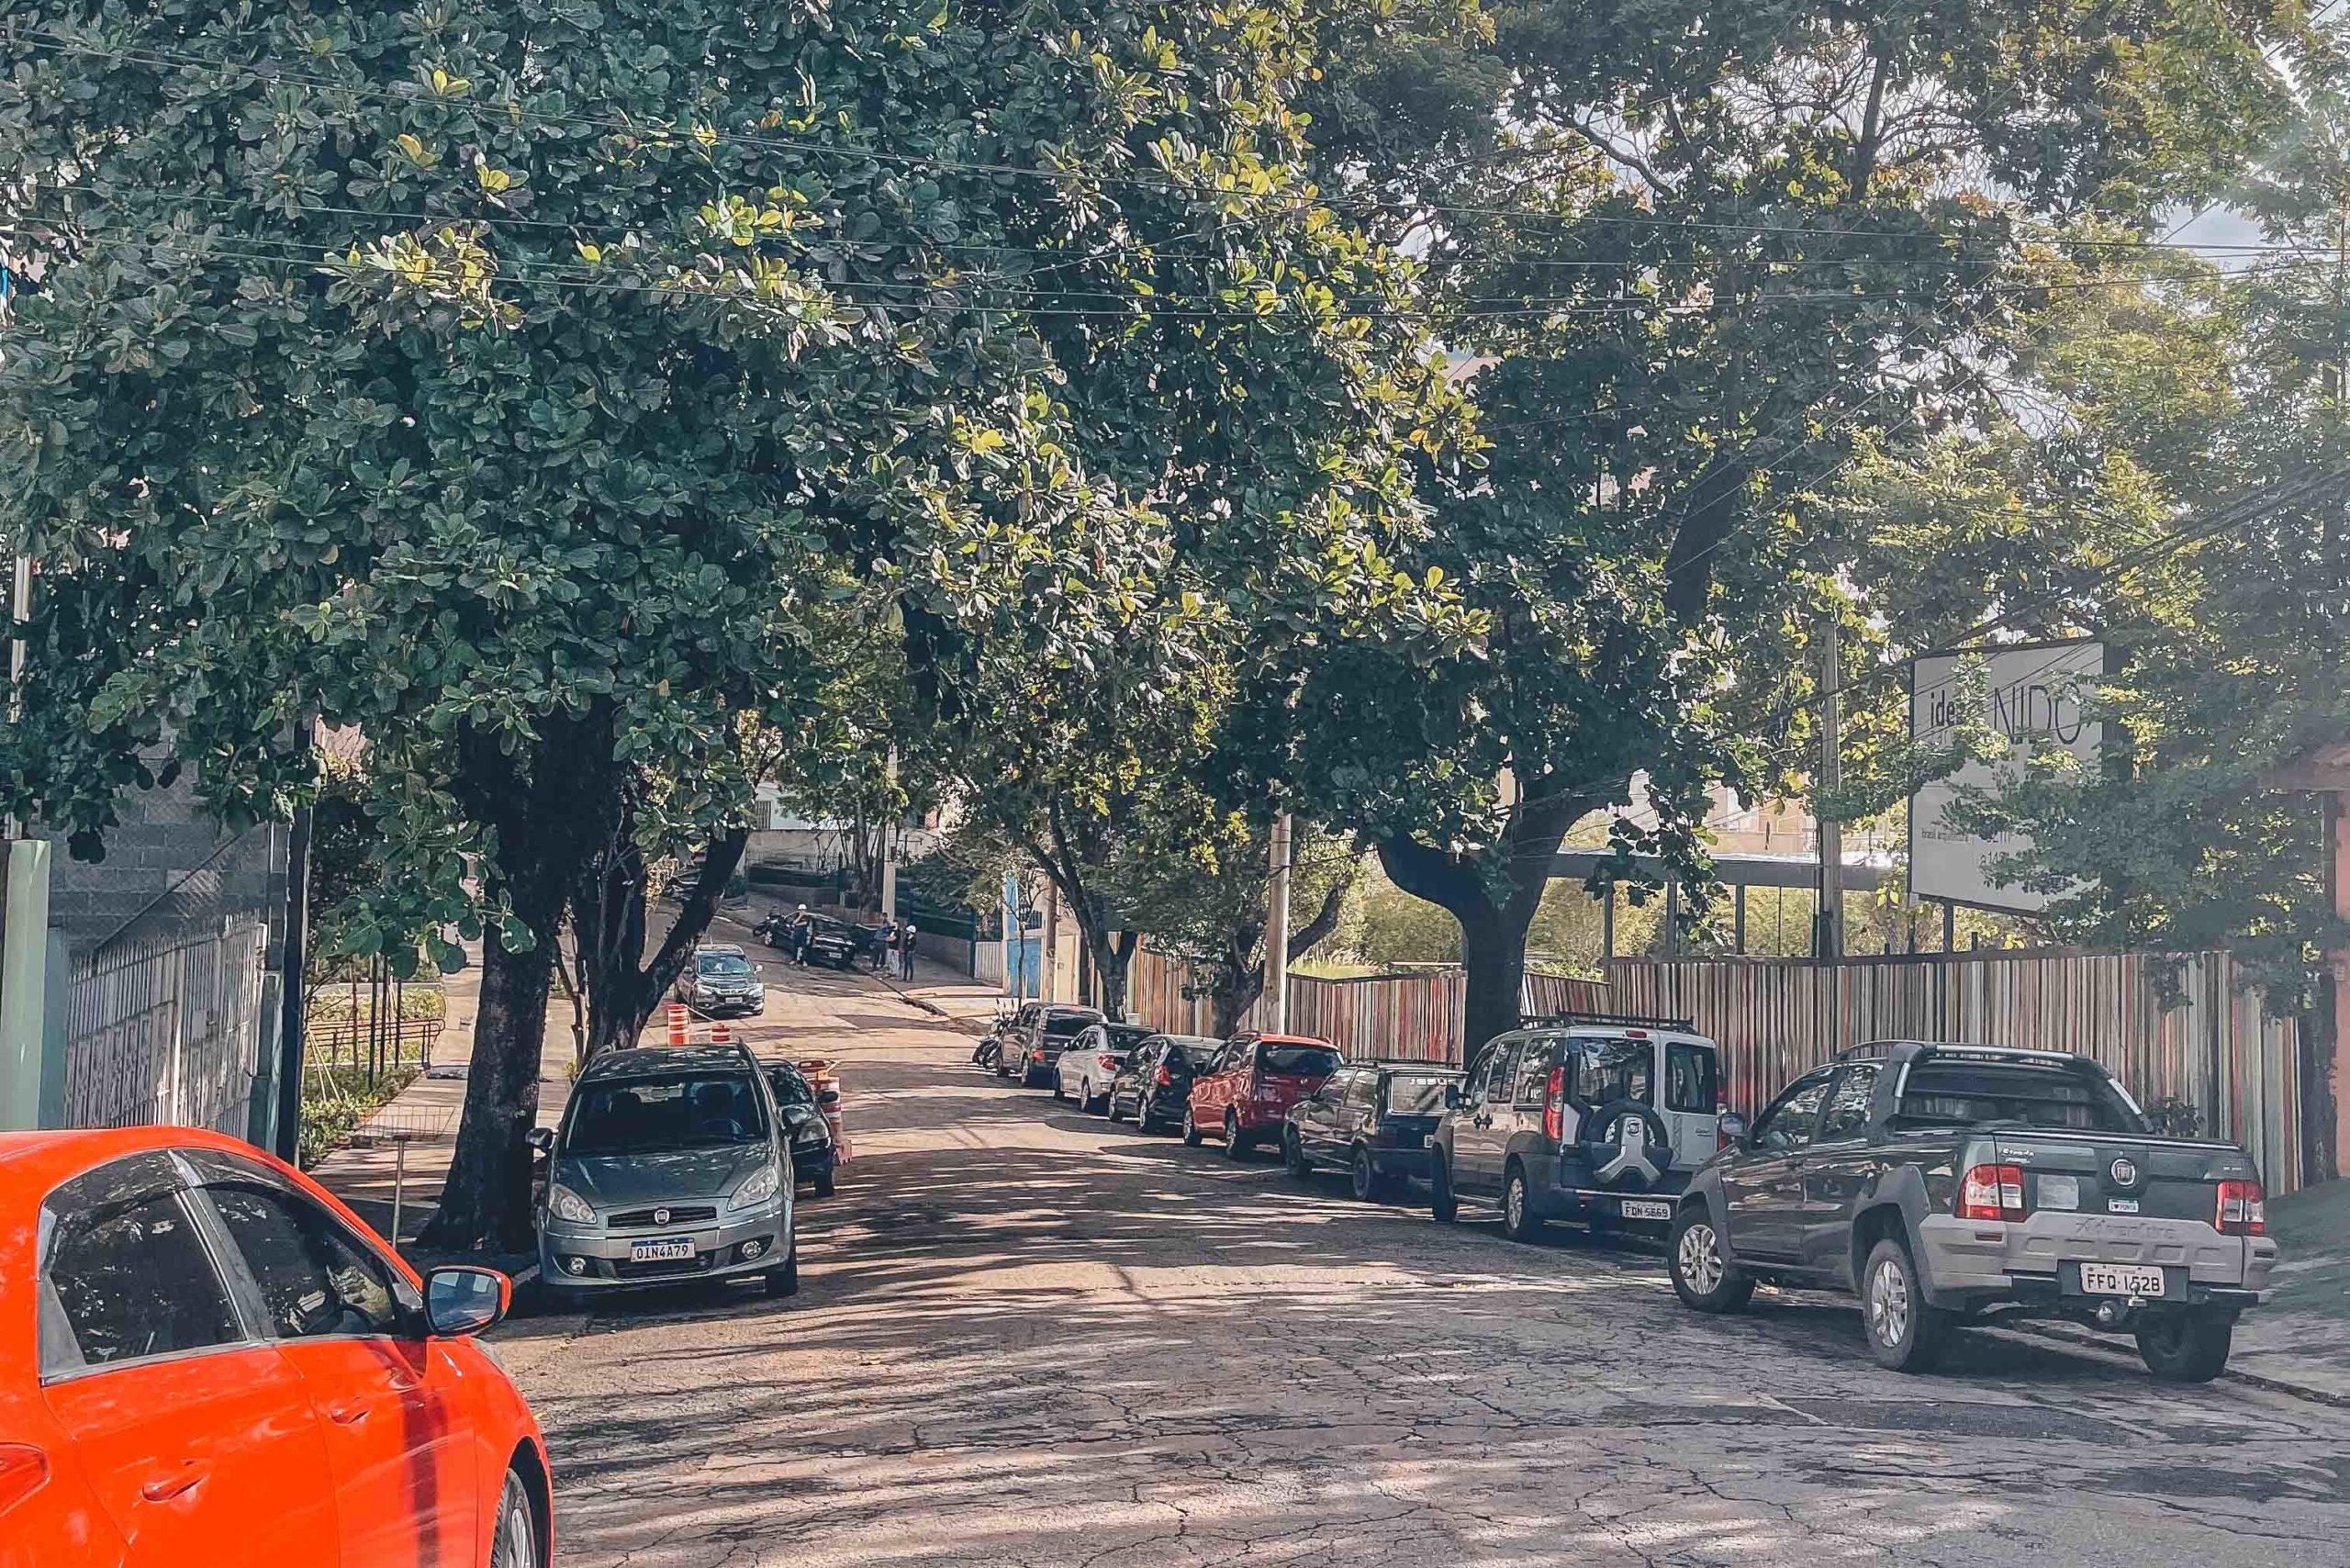 Vila Ipojuca - bairro em sao paulo - edificio nido ideazarvos